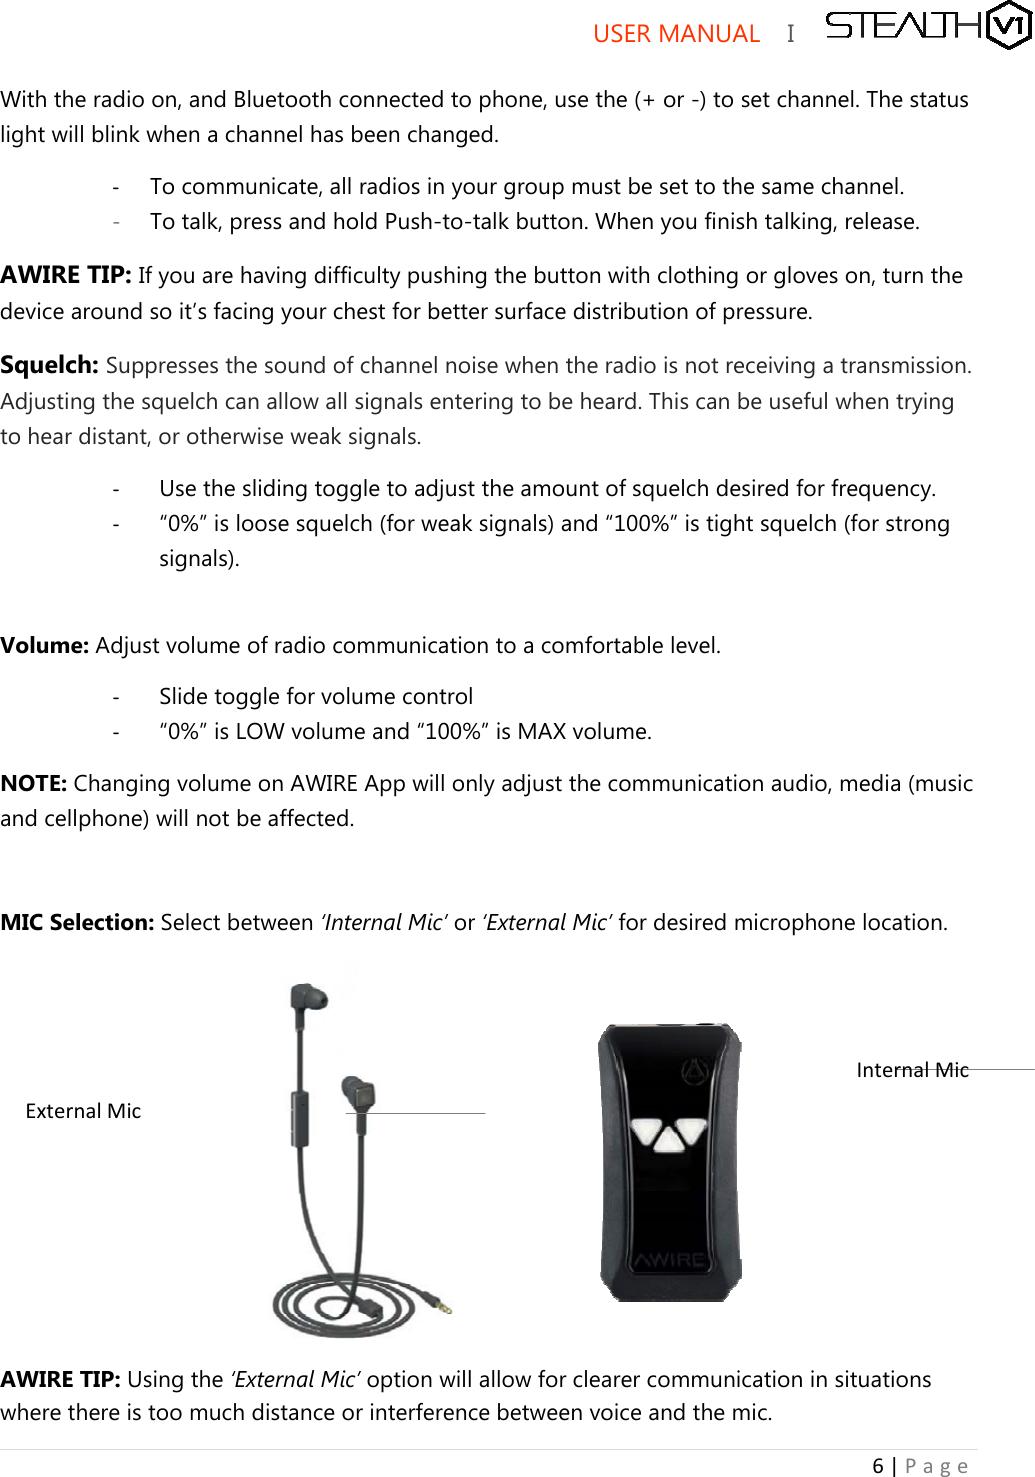 Apr 2016 Vet Talk Manual Guide